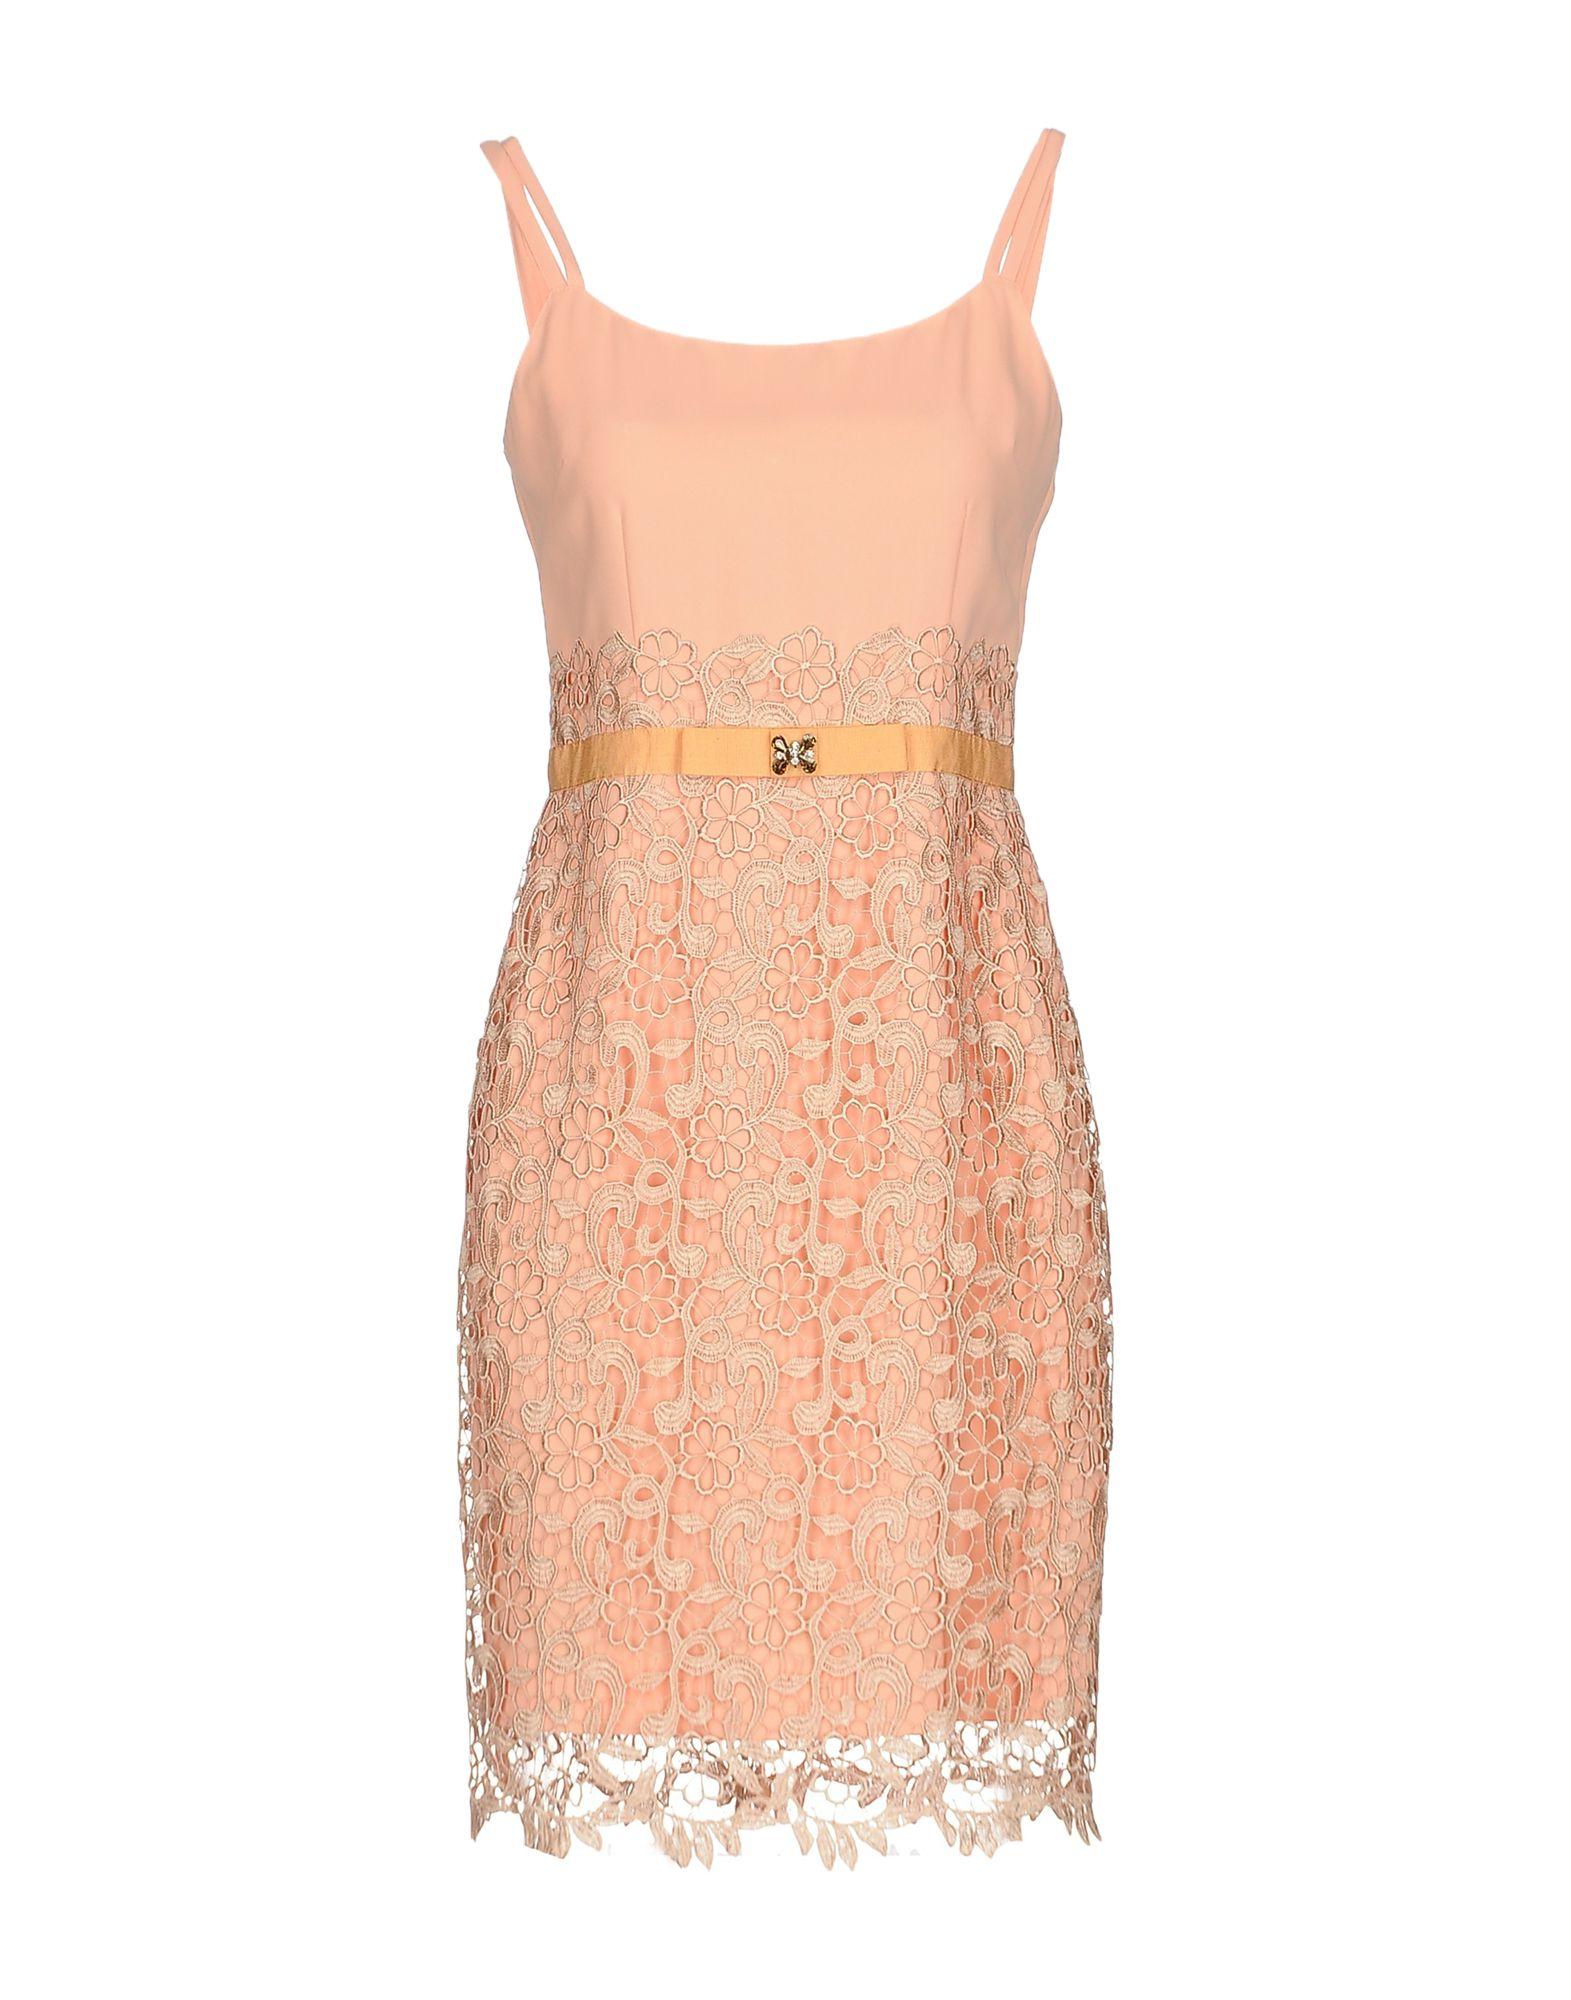 цена CLÓ by CLAUDIA B. Короткое платье онлайн в 2017 году